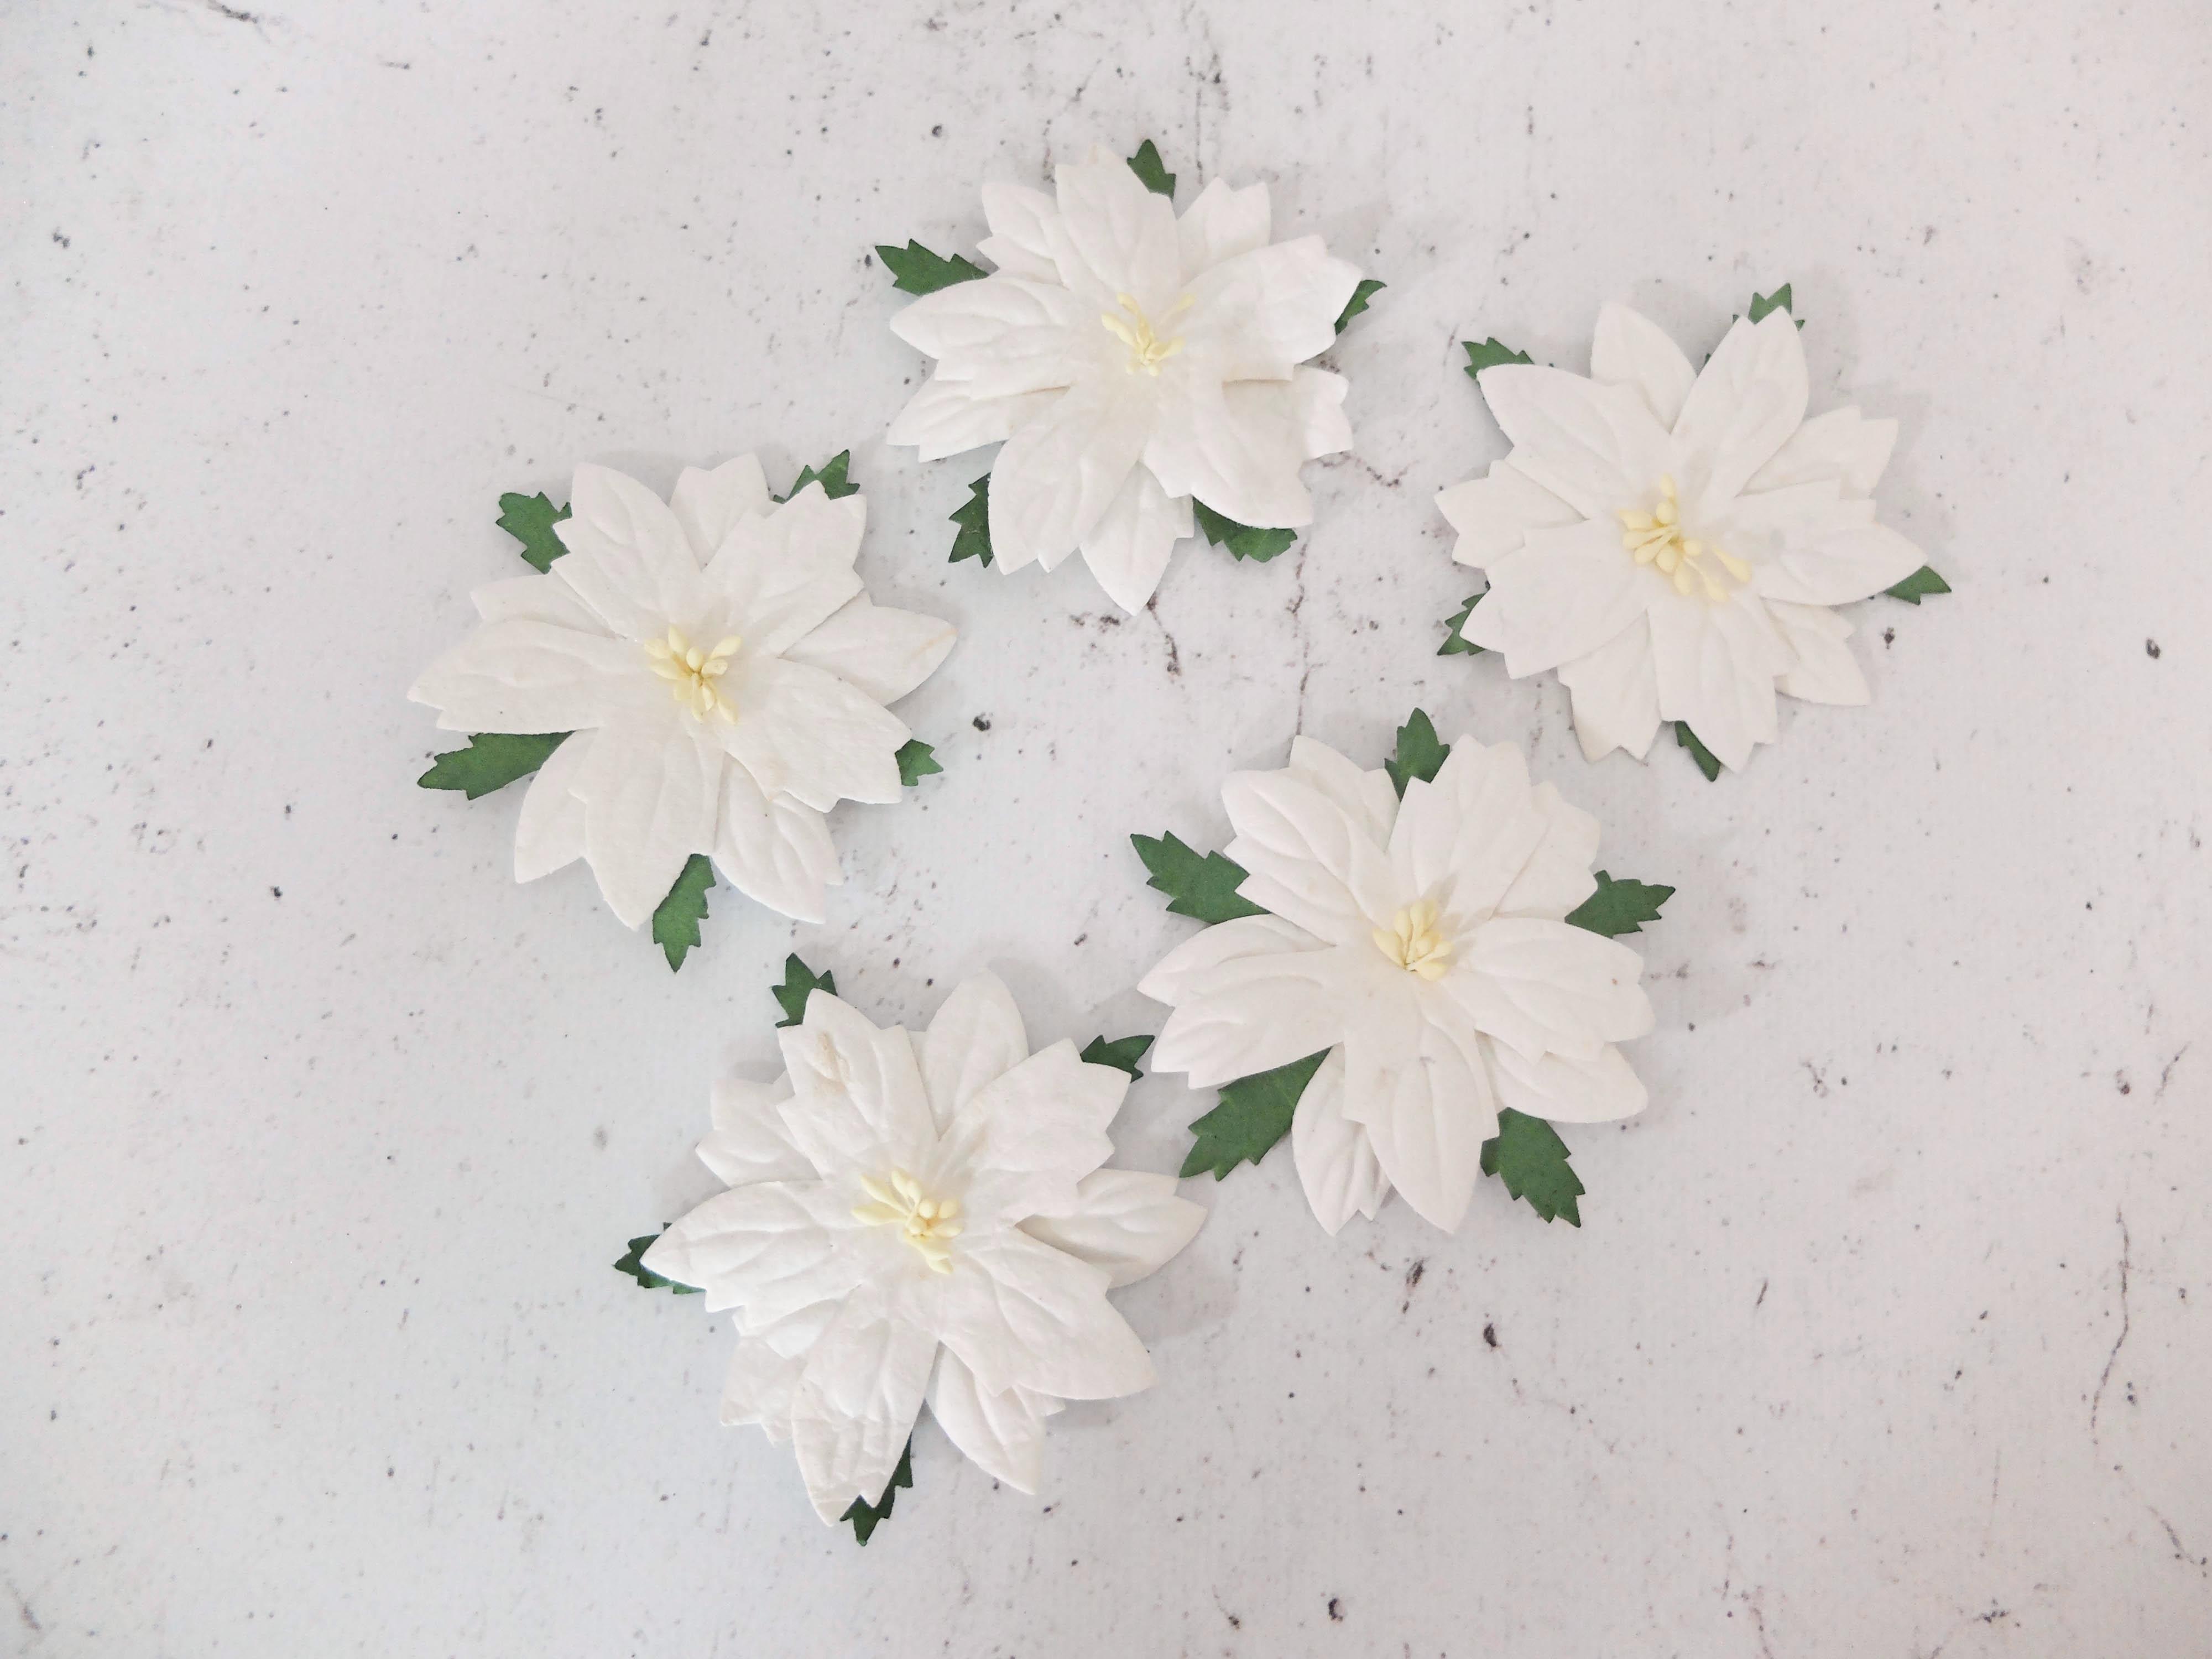 6 Cm Paper Poinsettia White Flat Christmas Flowers Embellishments